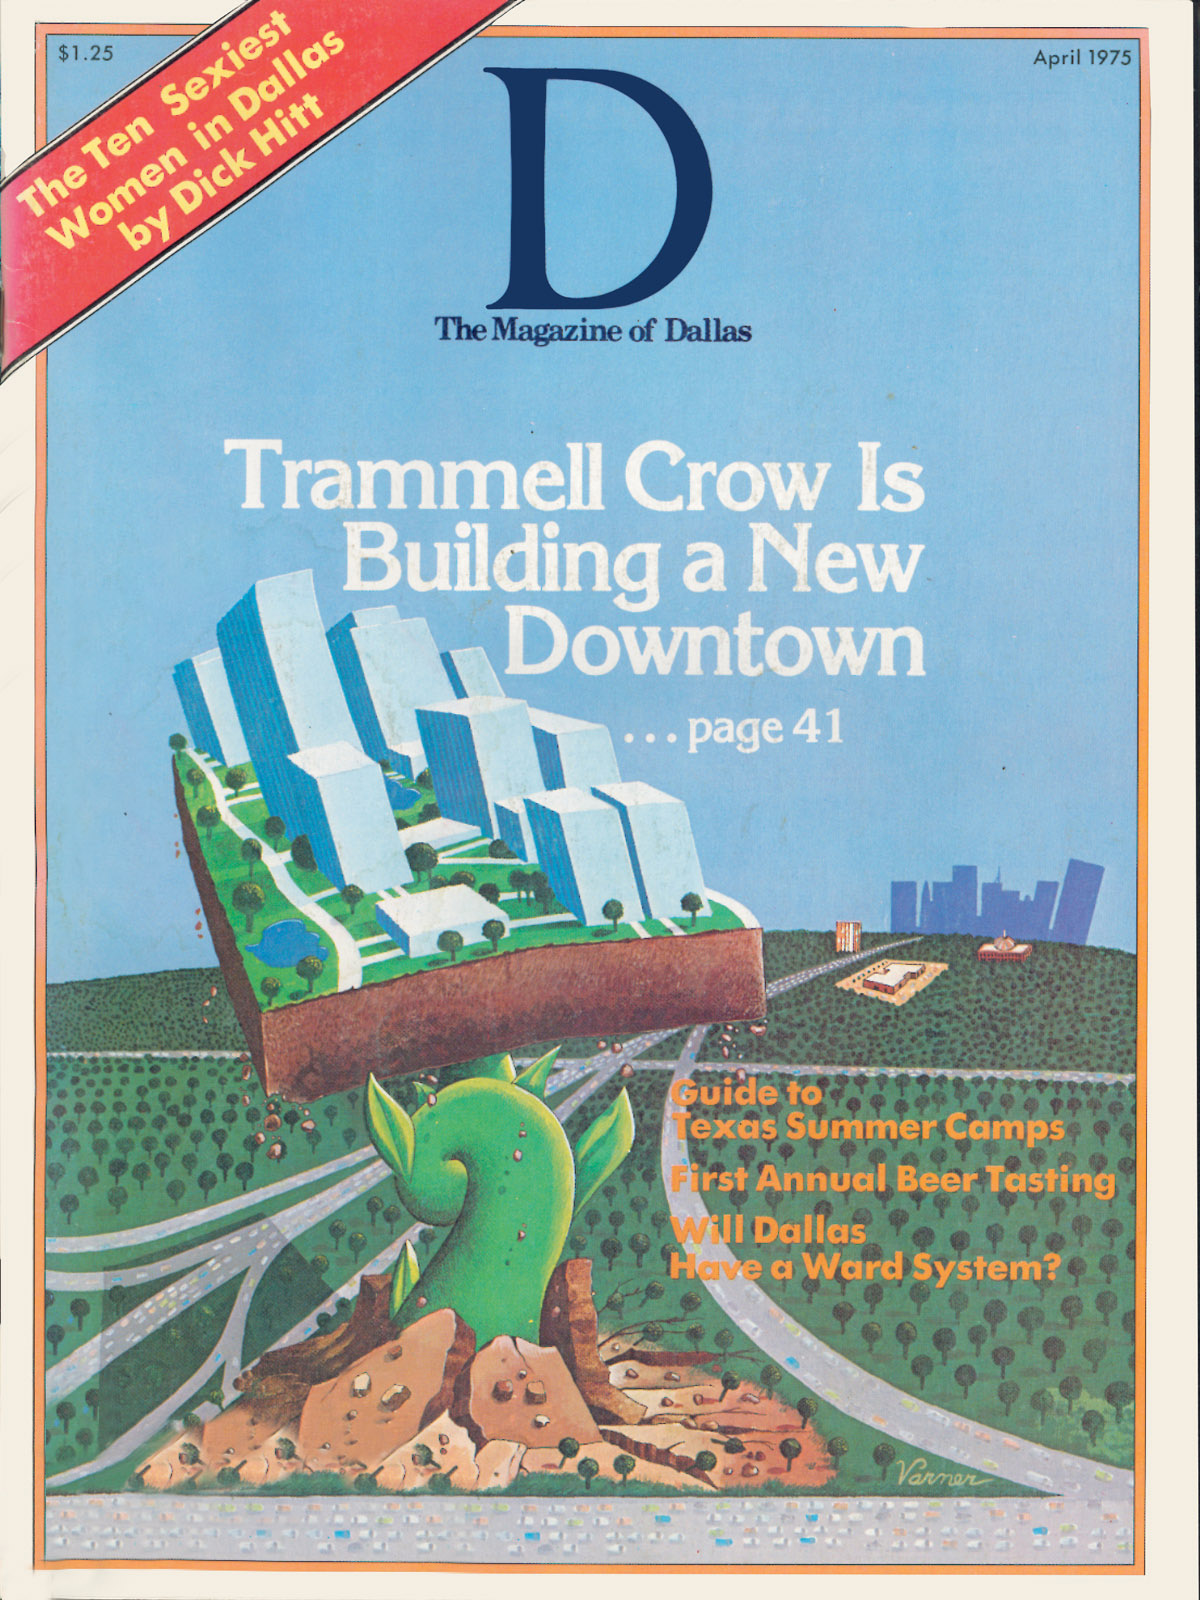 April 1975 cover